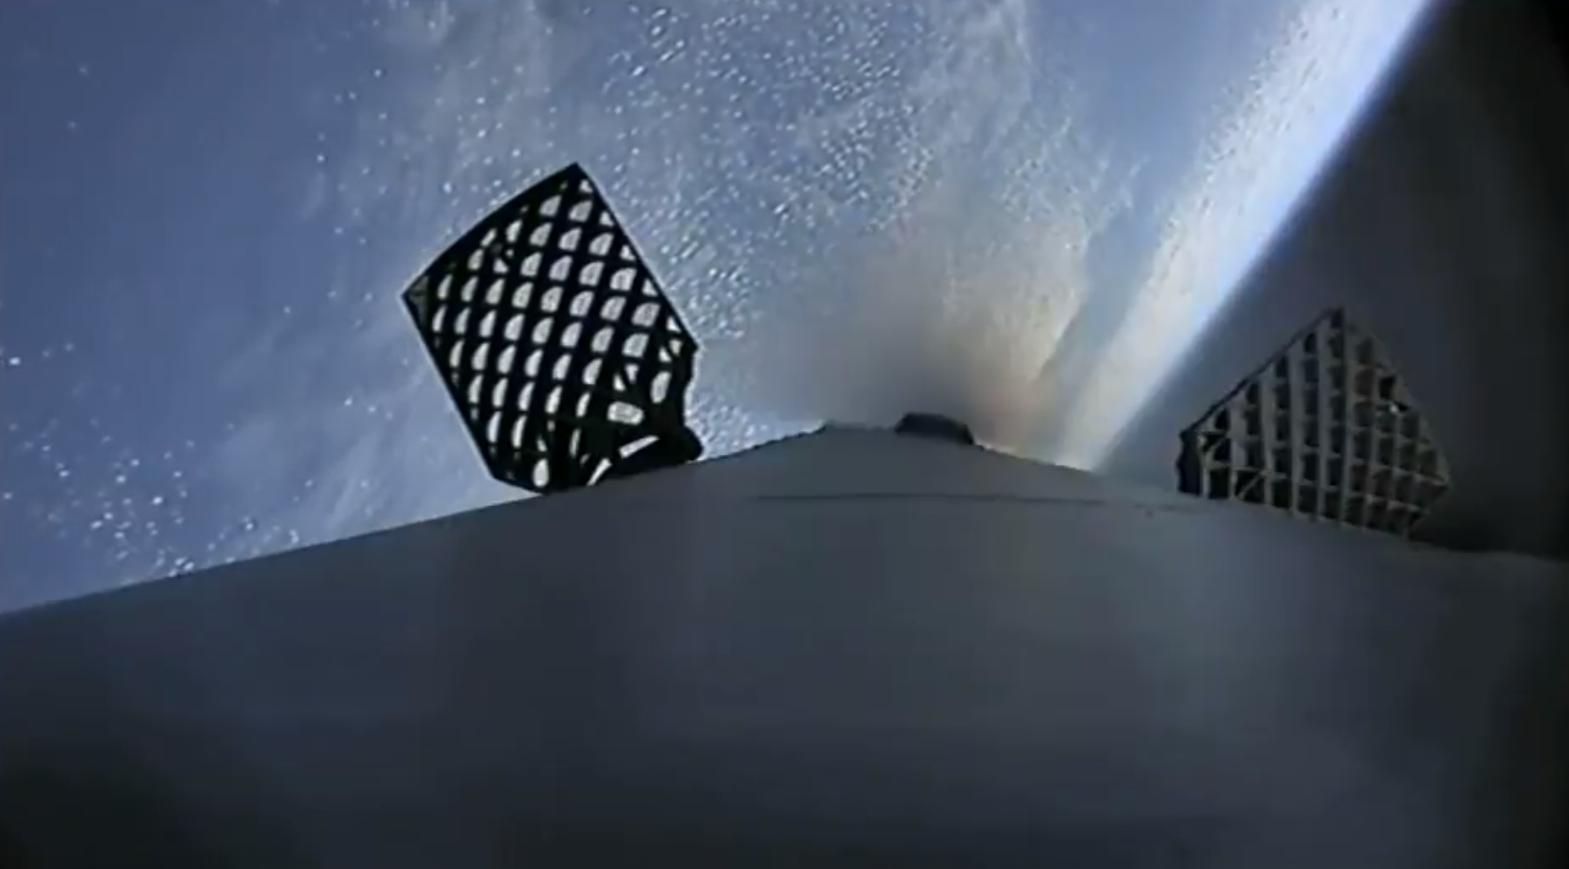 Falcon 9 B1050 CRS-16 landing (SpaceX) 2